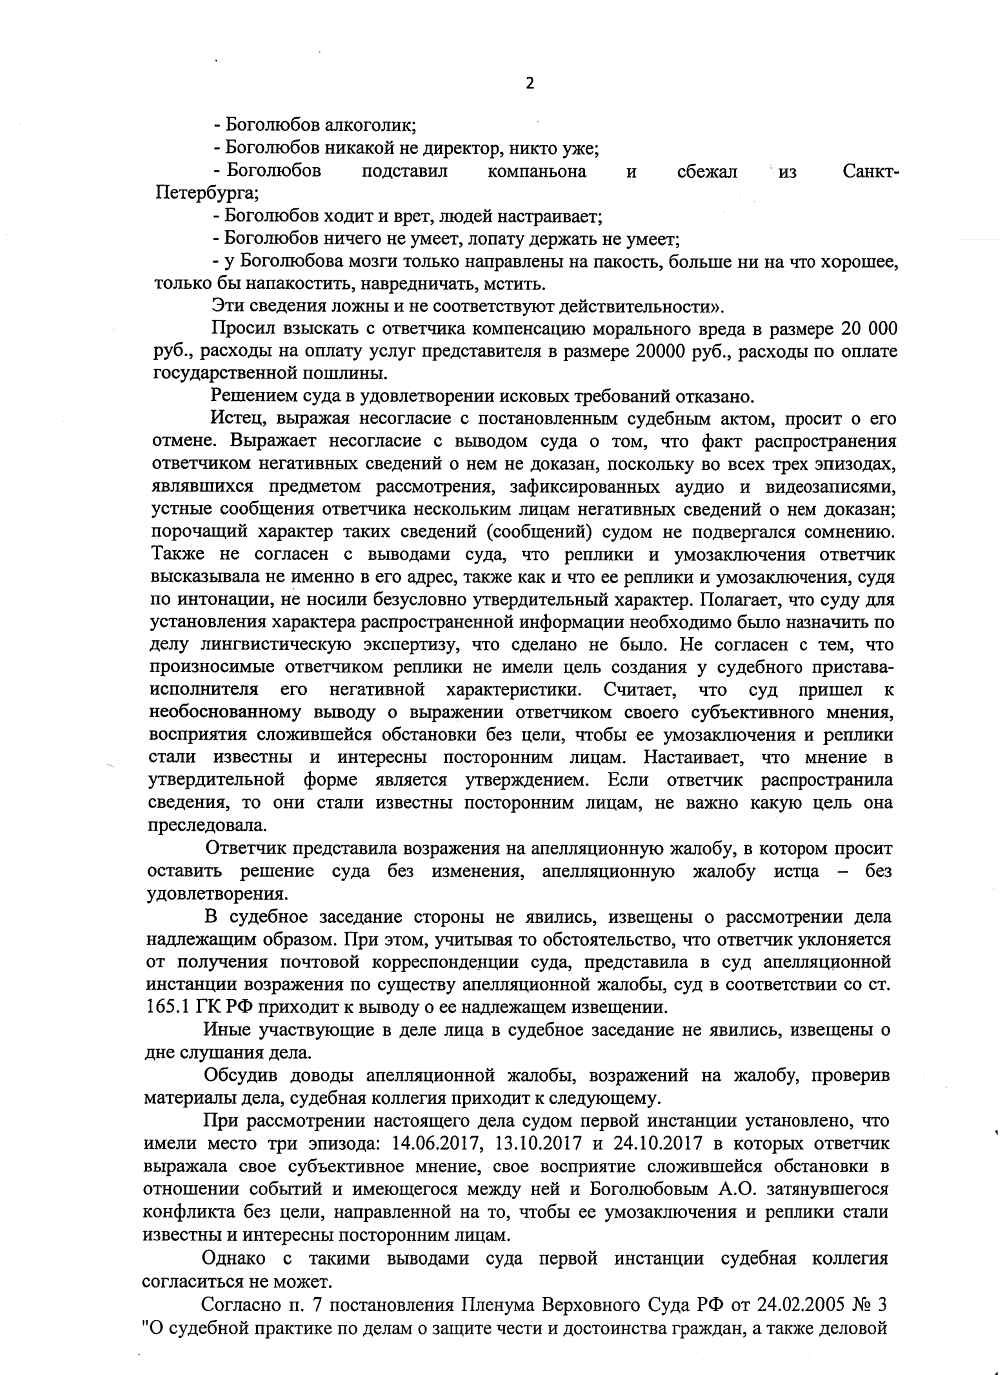 https://sontgranit.ru/forum/img/sokol/20180406-определениеВС-2.png